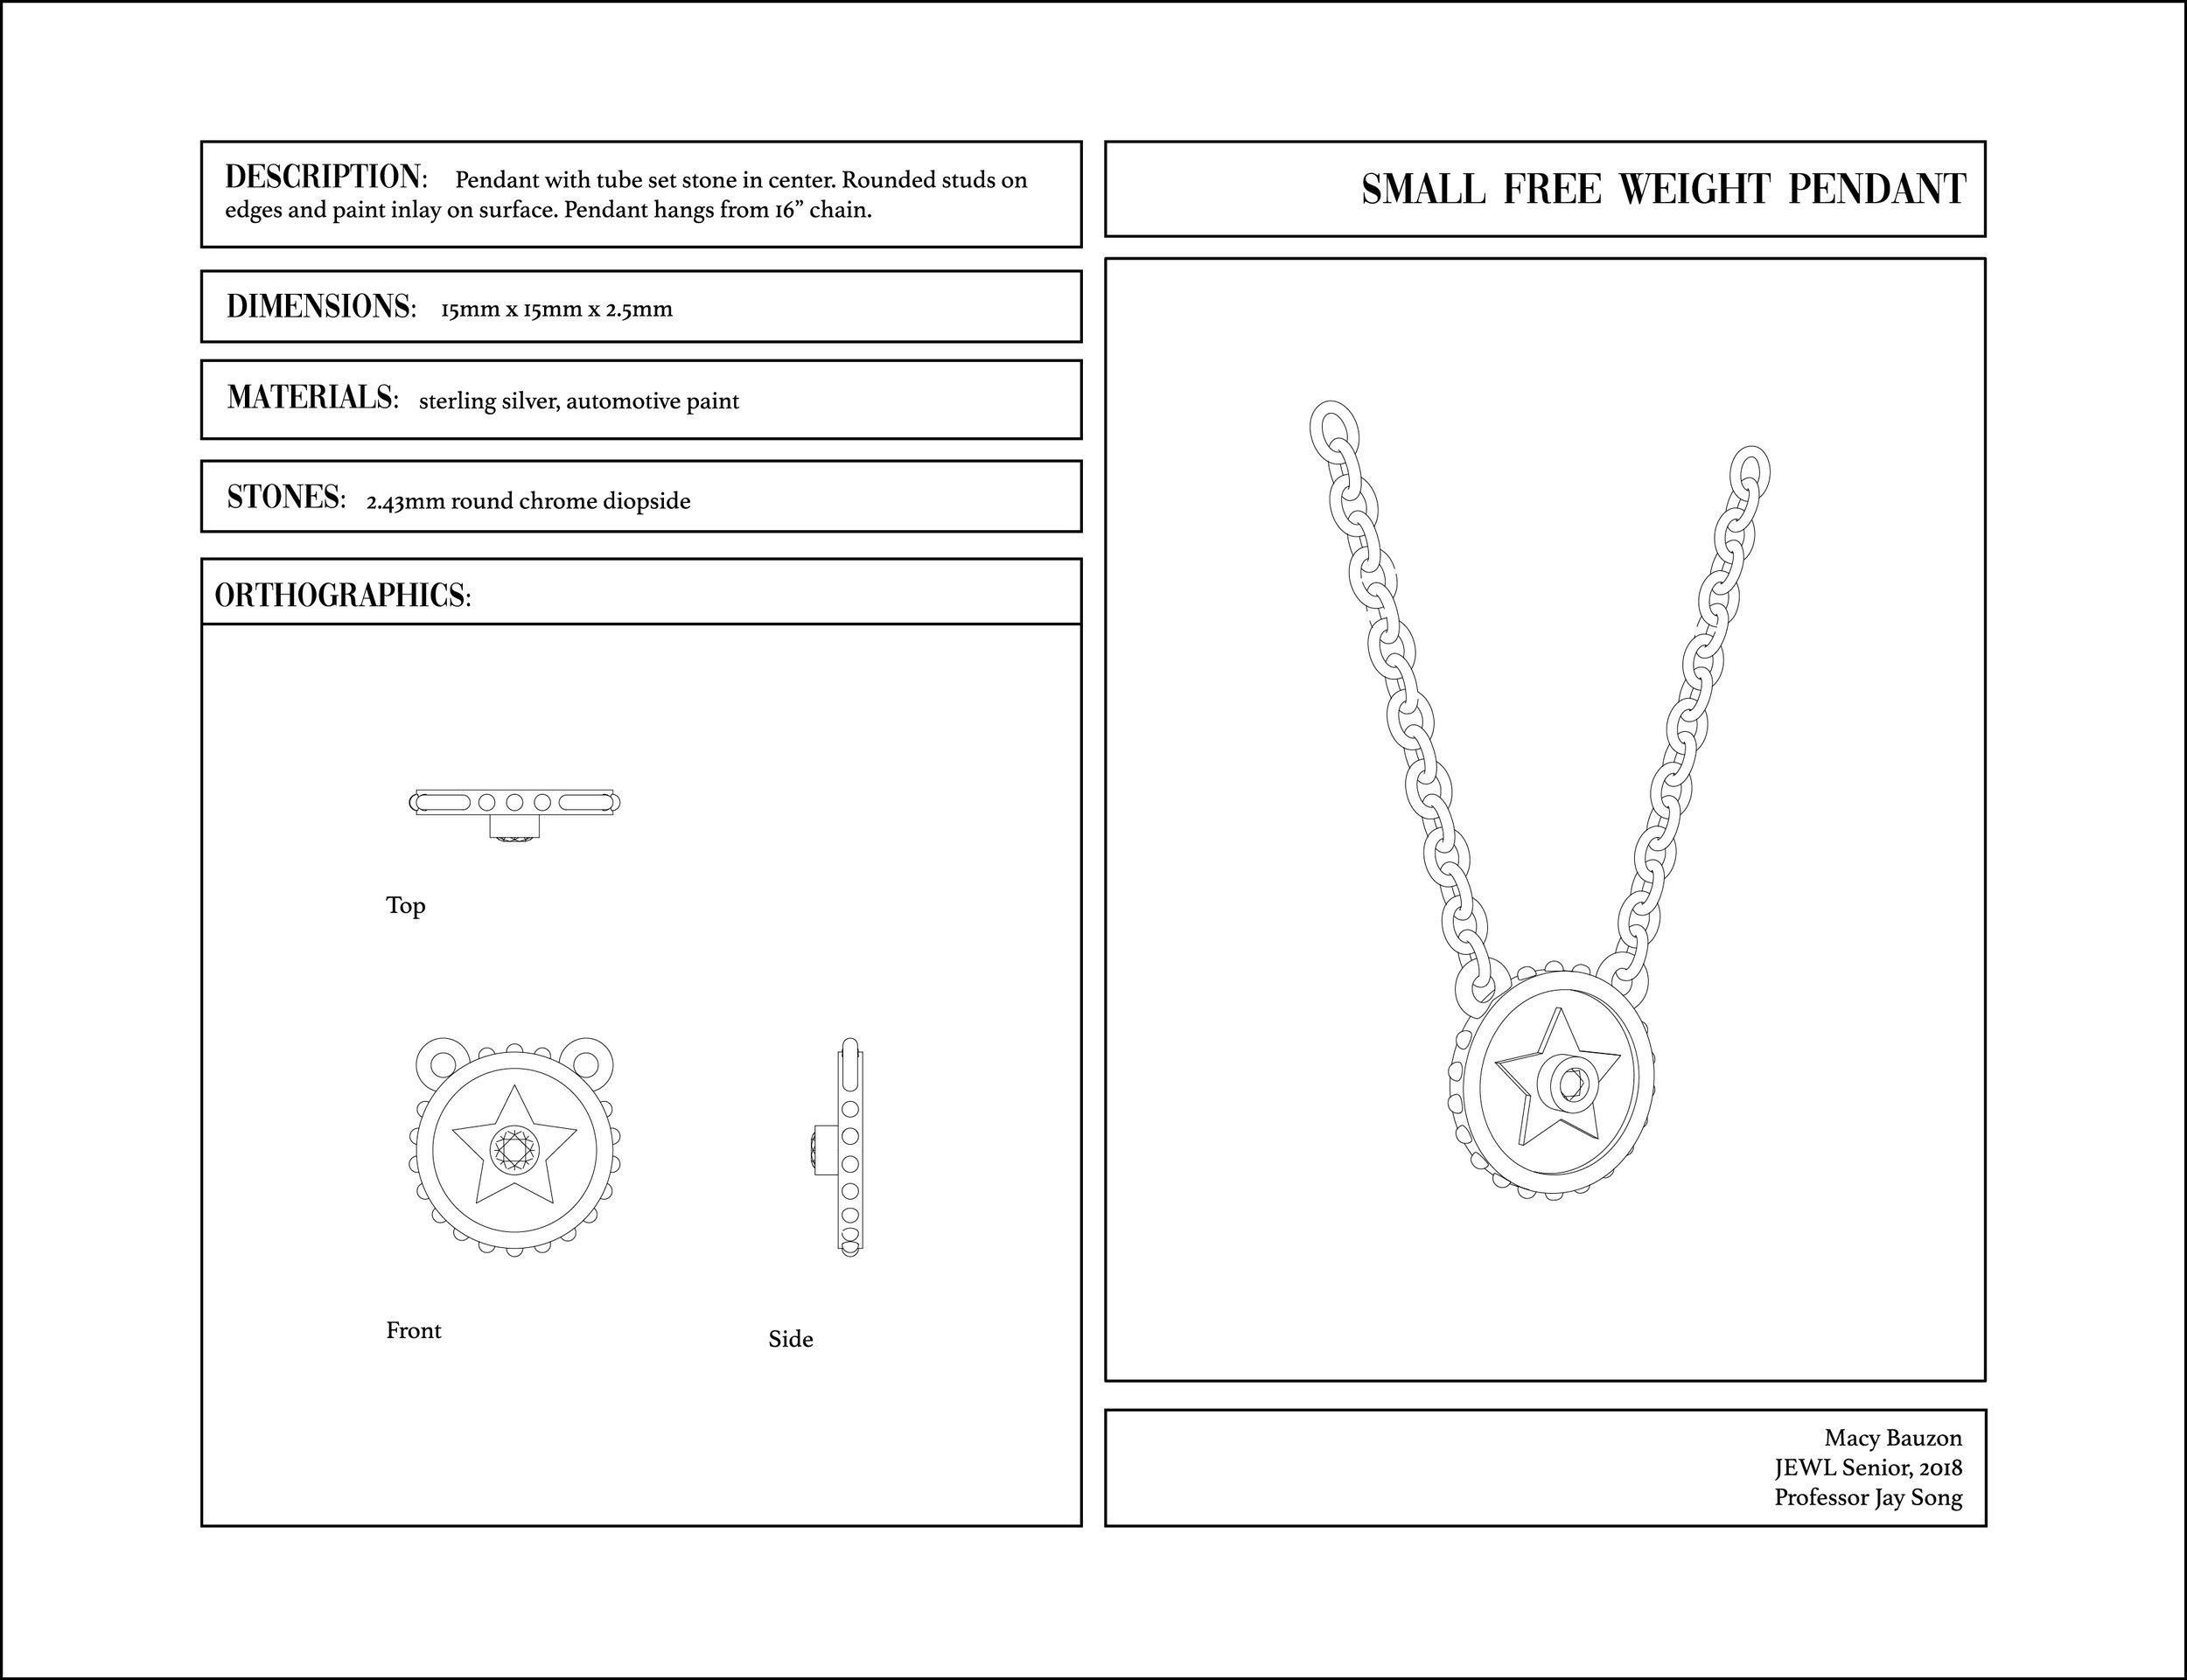 Small Free Weight Pendant Spec.jpg